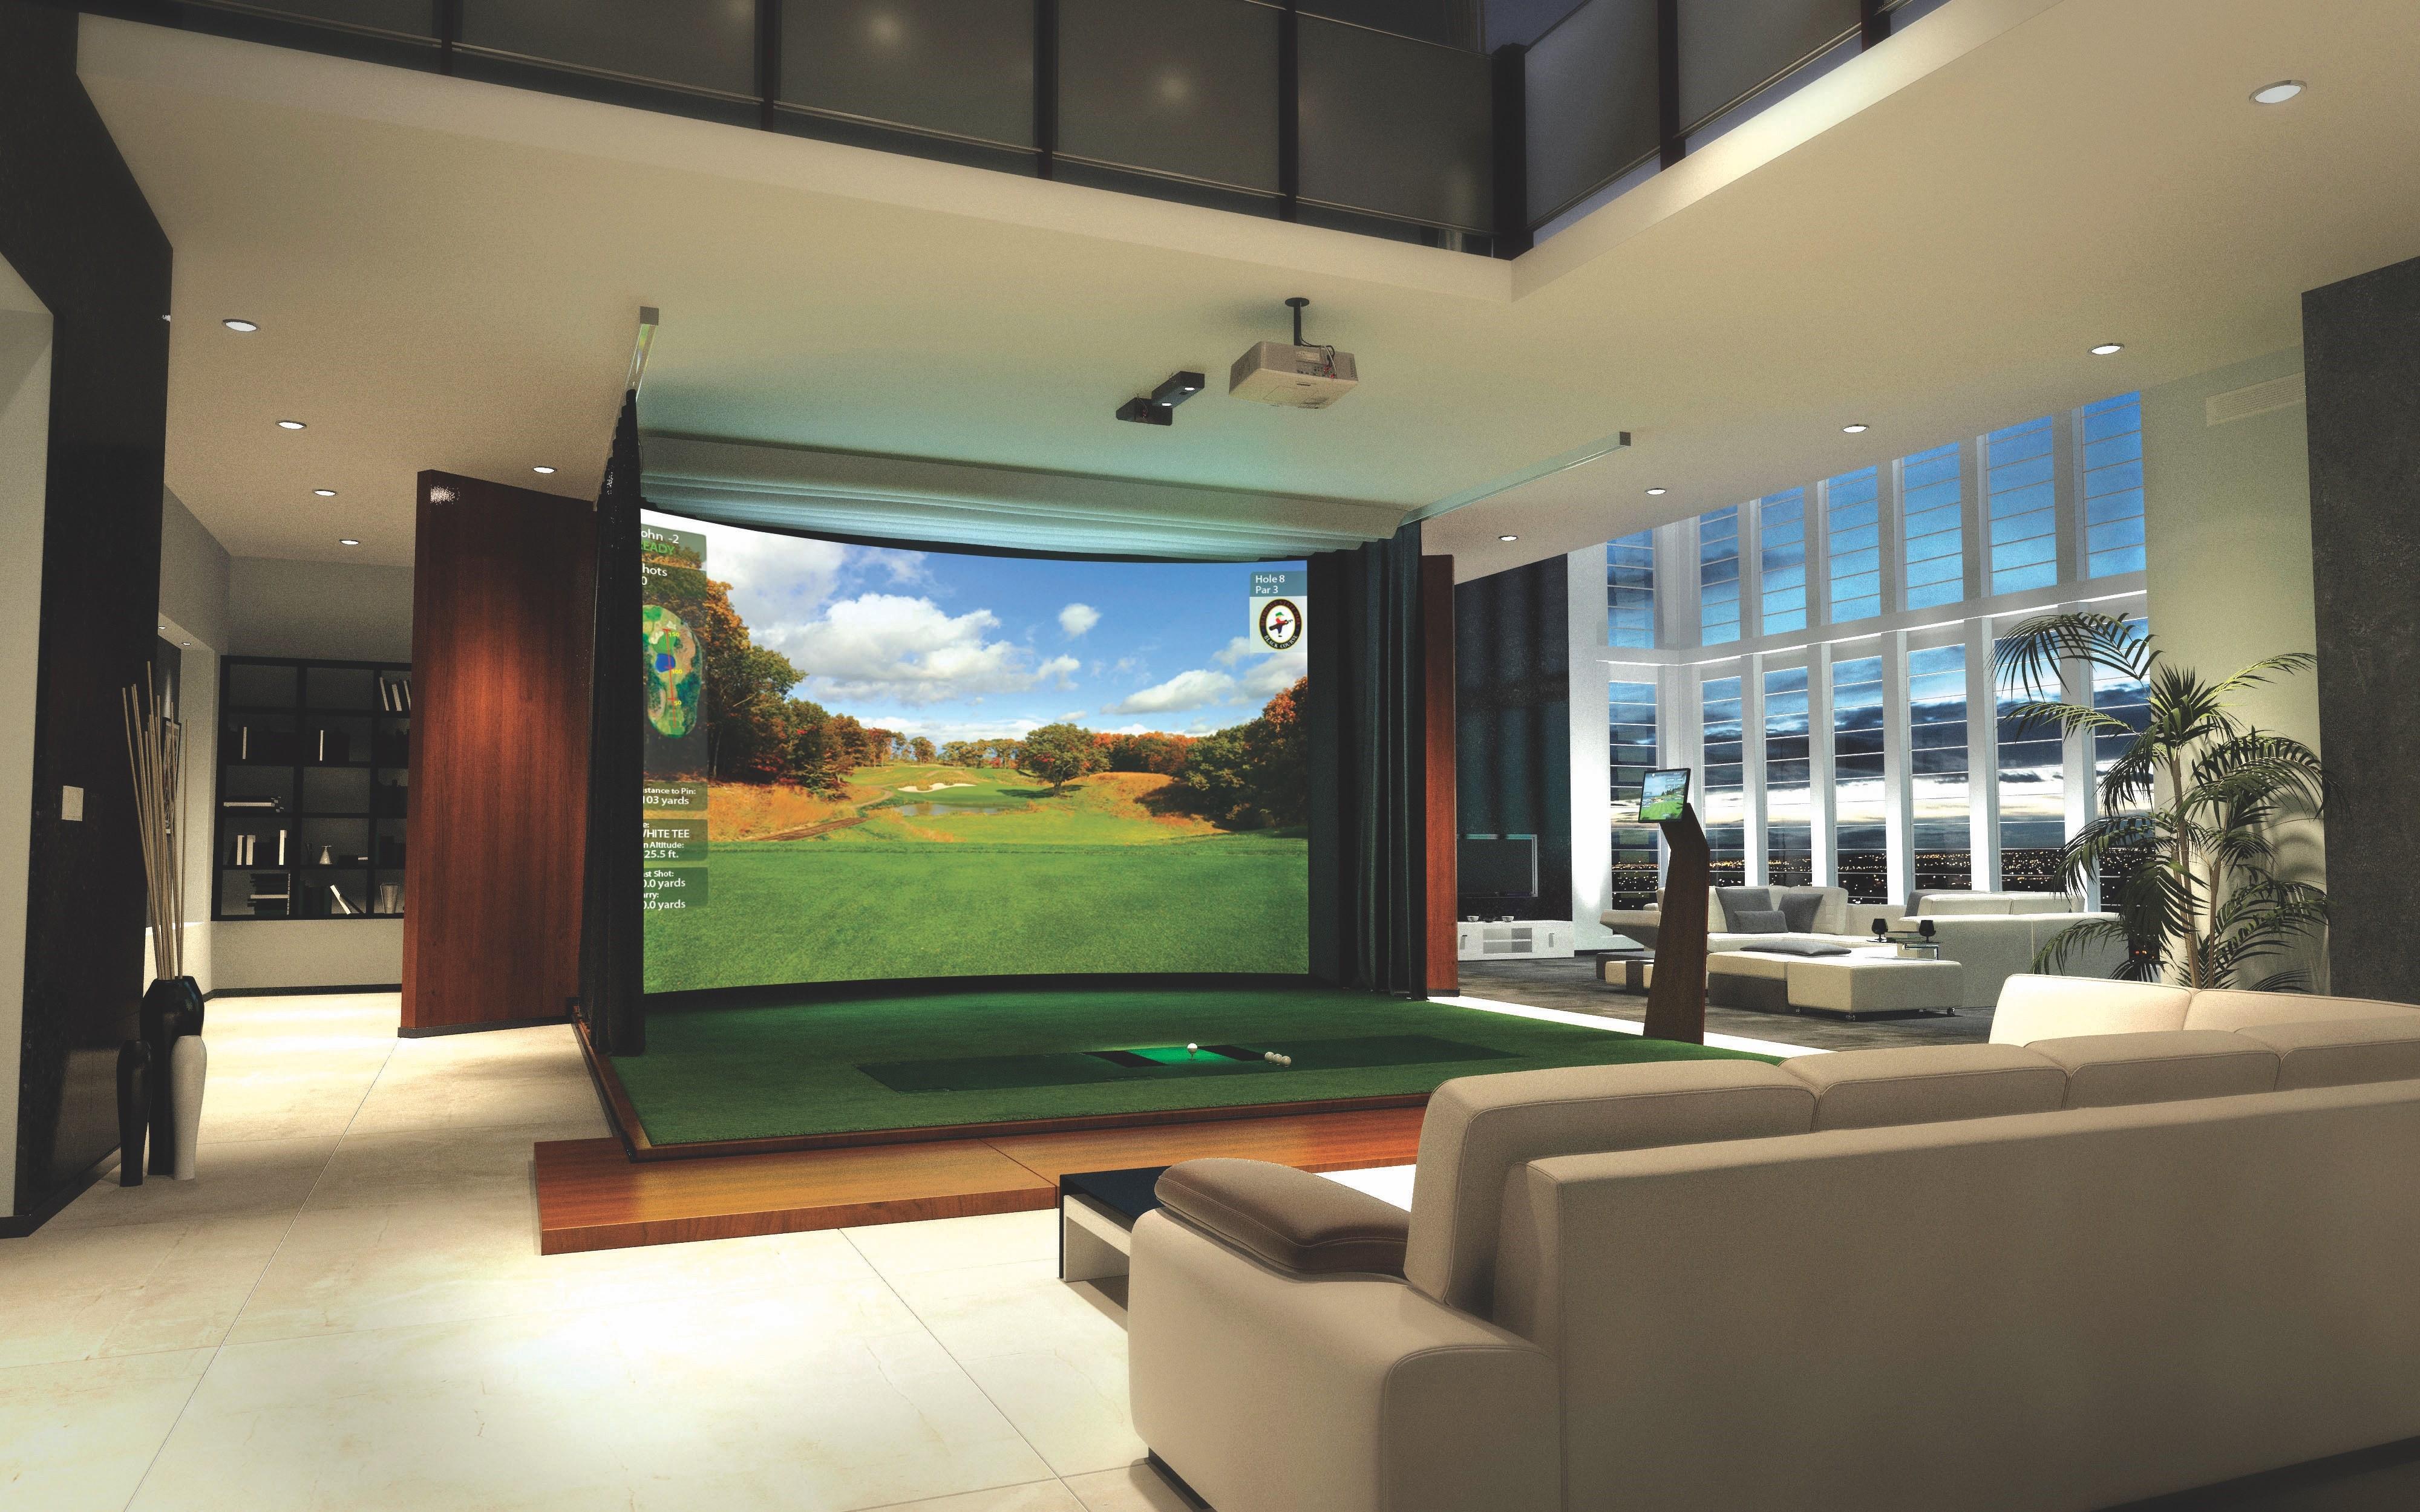 Sensational Top 4 Benefits Of A Golf Simulator For Your Home Interior Design Ideas Skatsoteloinfo